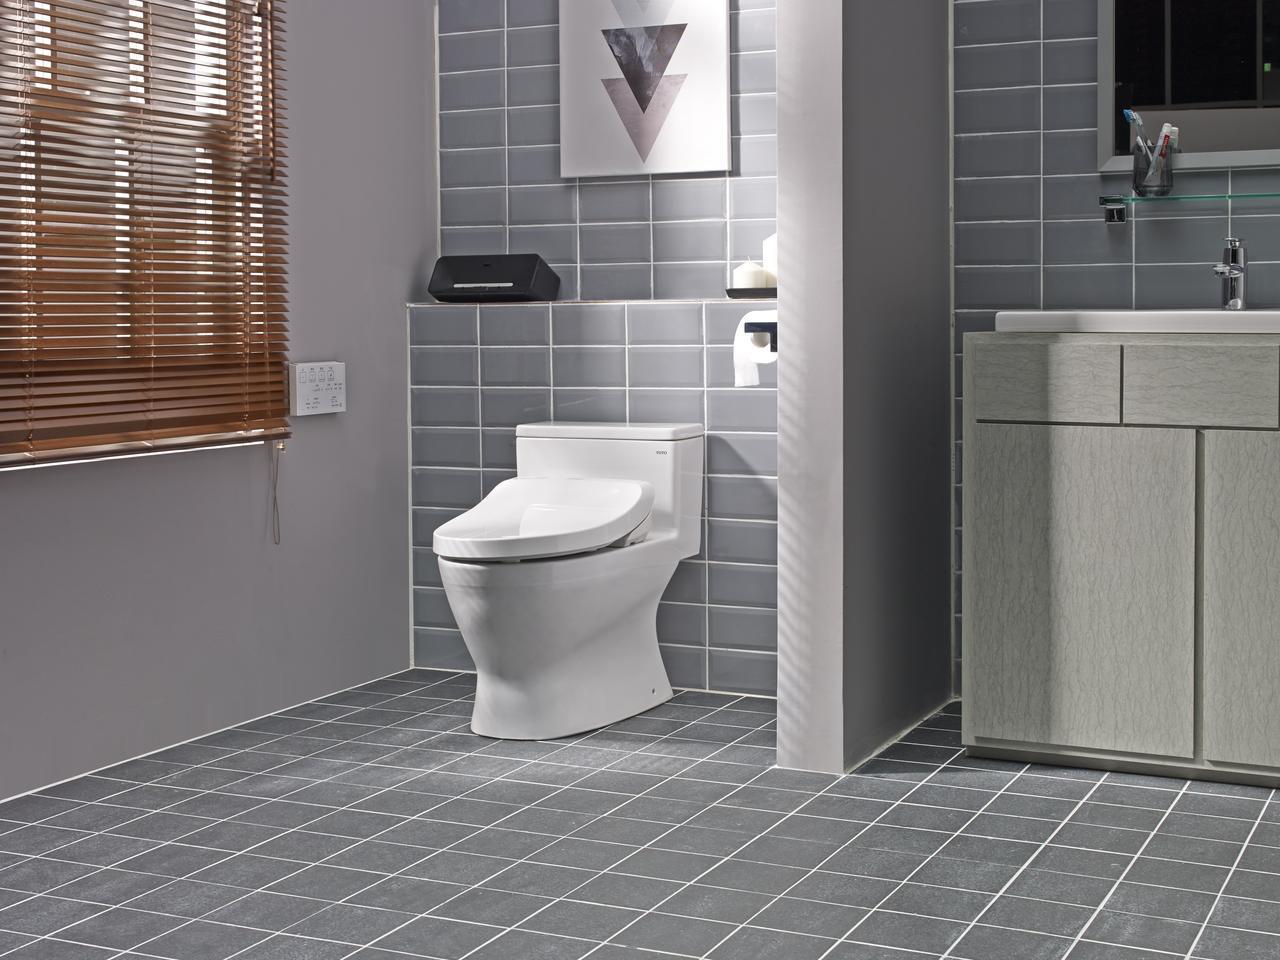 TOTO WASHLET溫水洗淨便座提供多種款式供消費者選擇,將於4月1日起推出...